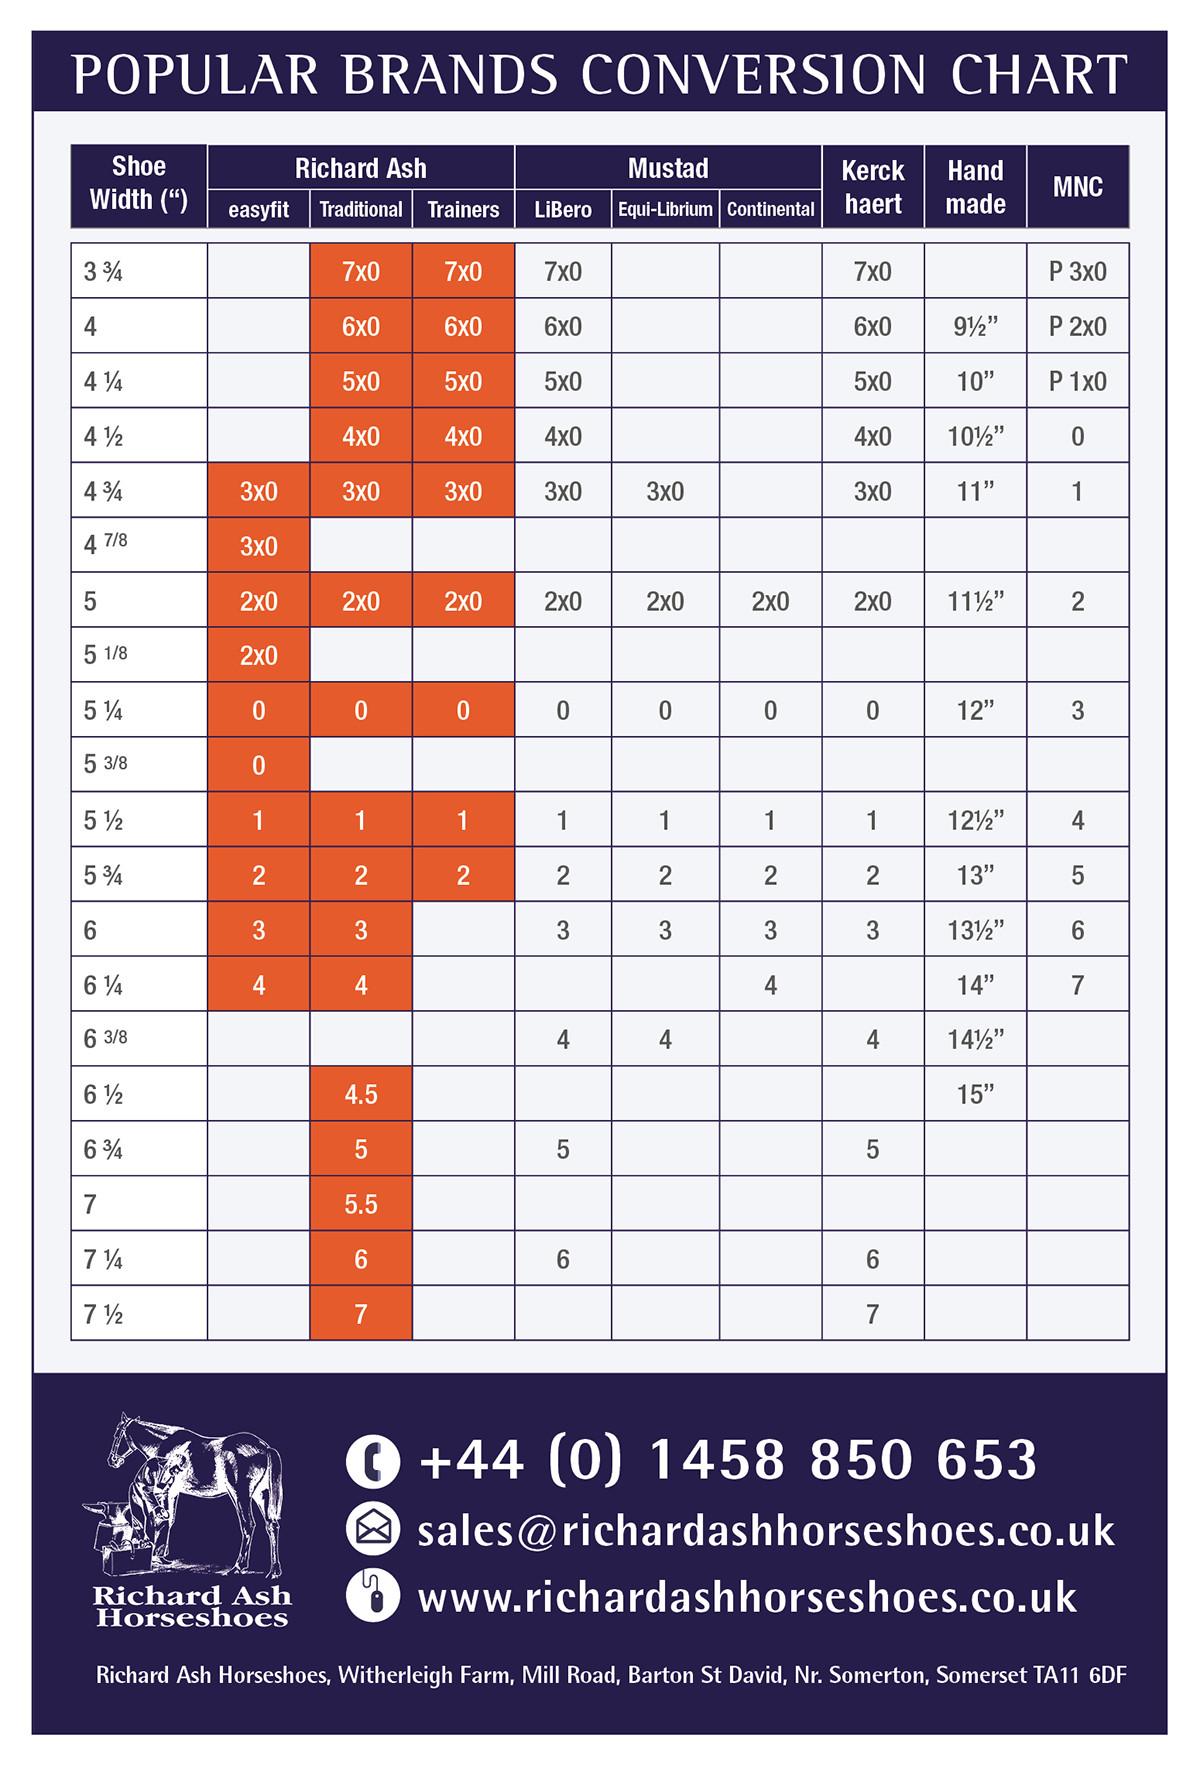 richard-ash-popular-brands-chart.jpg